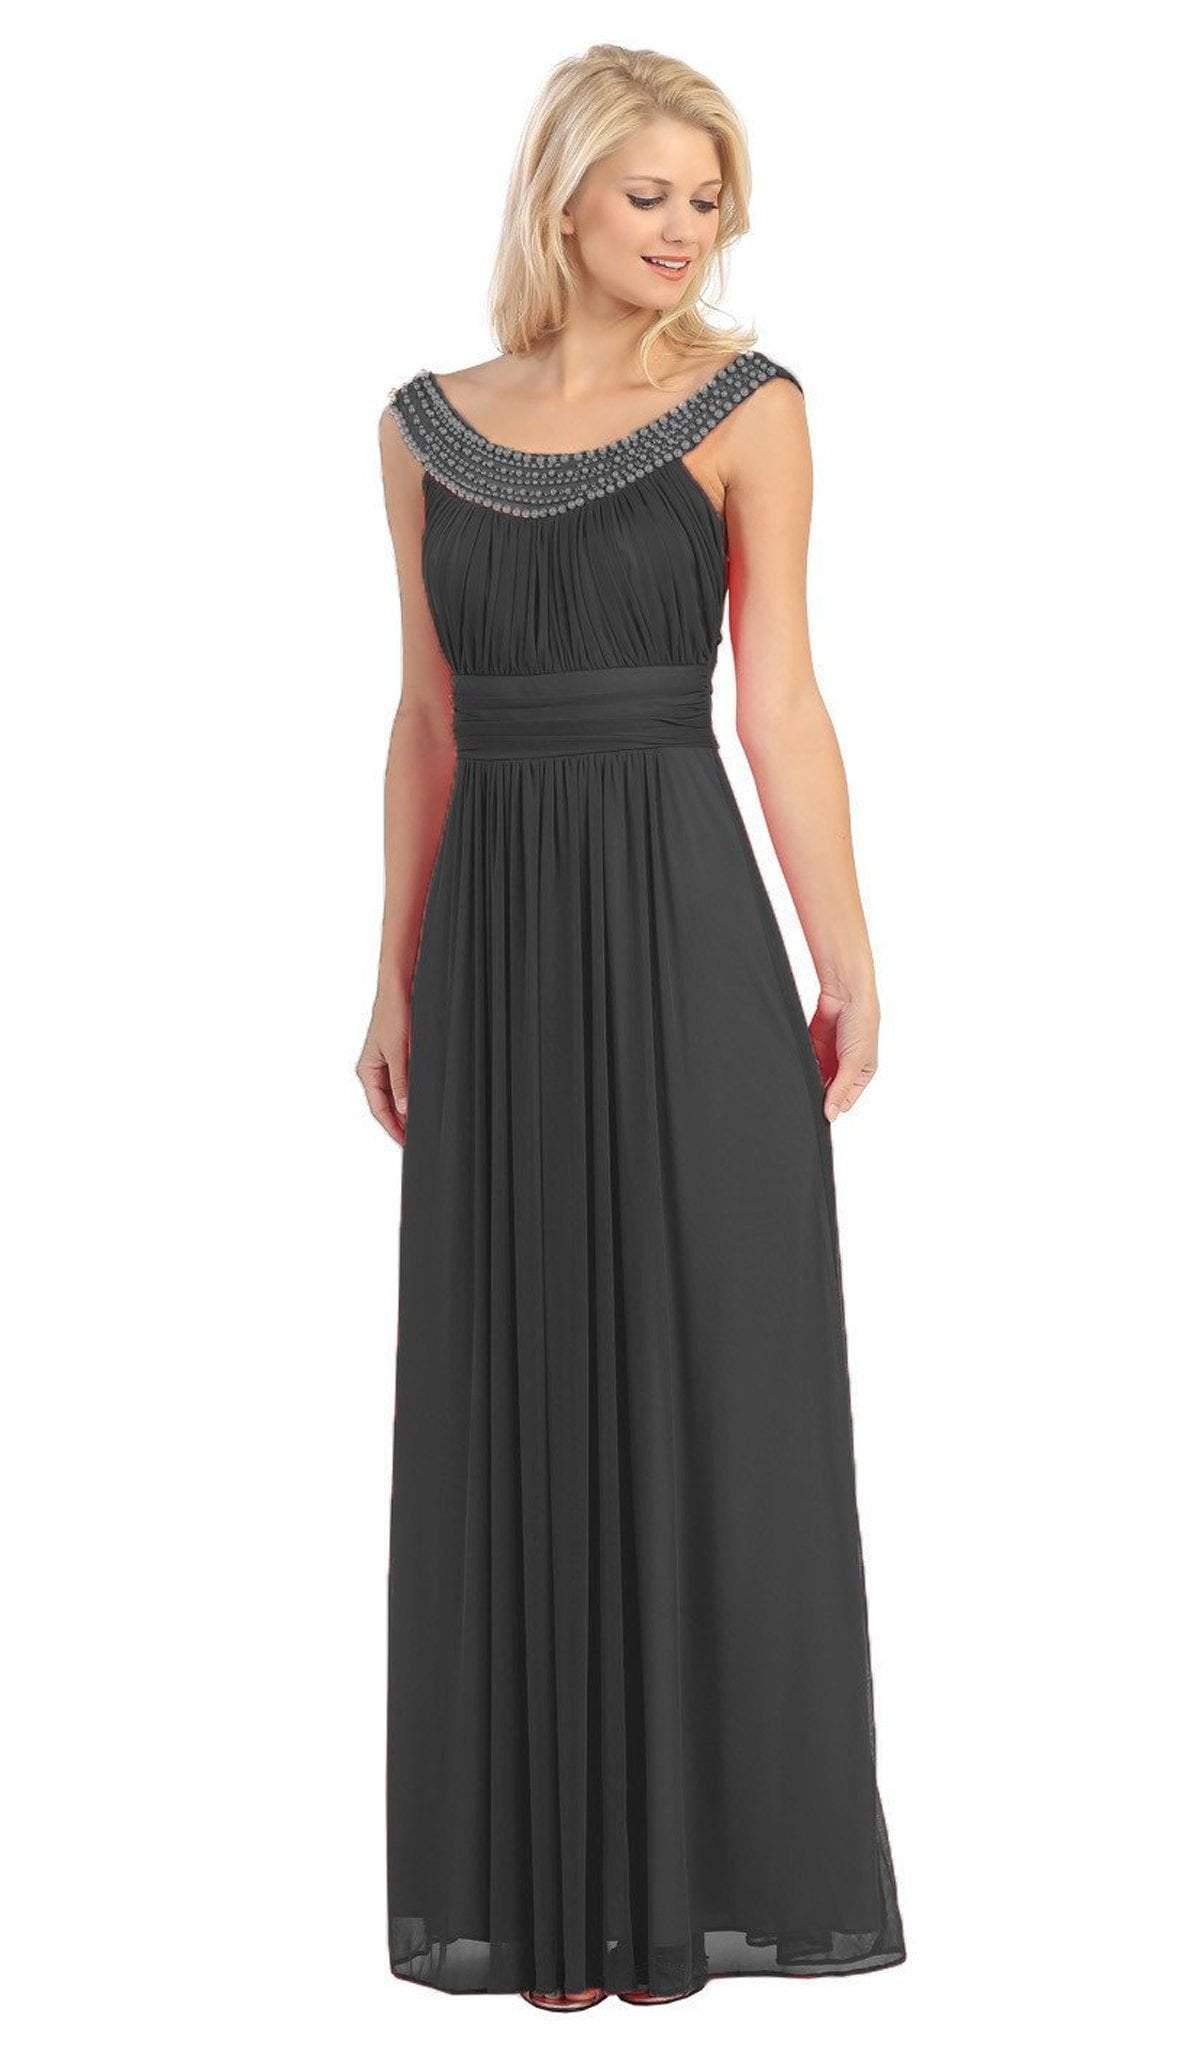 Eureka Fashion - 2027 Pearl Embroidered Neckline Chiffon A-Line Gown